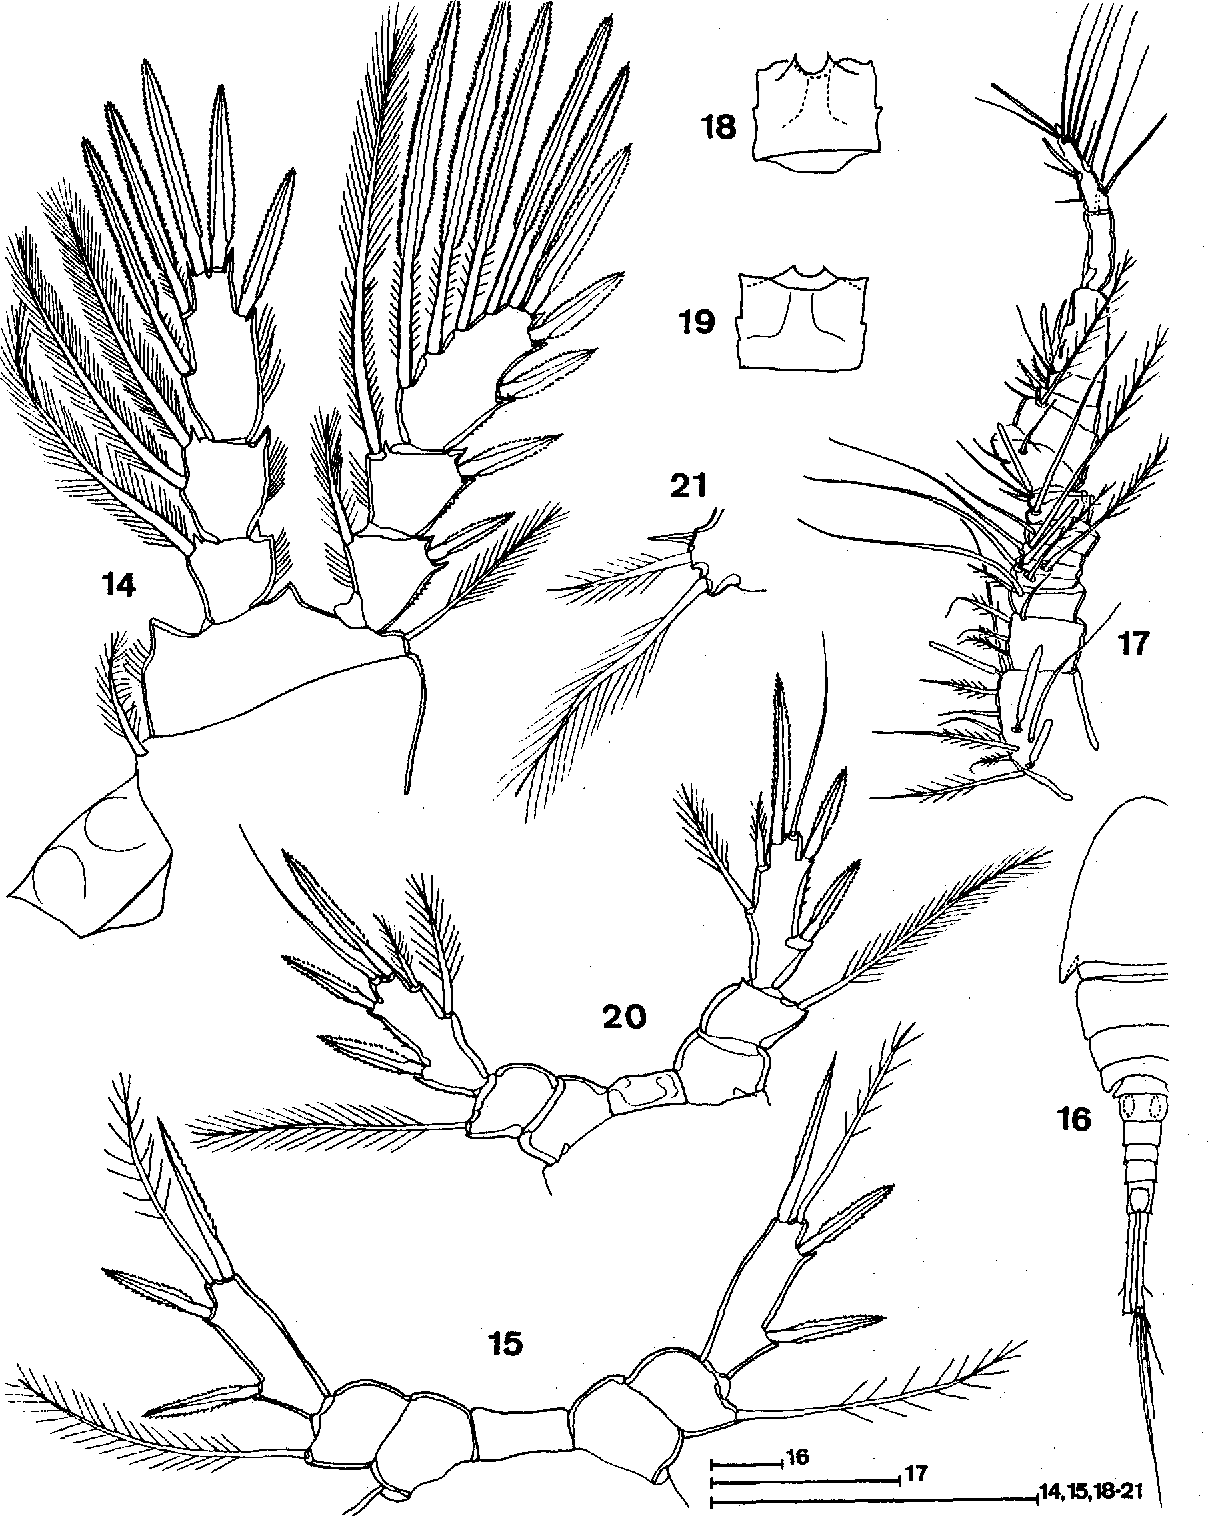 figure 14-21